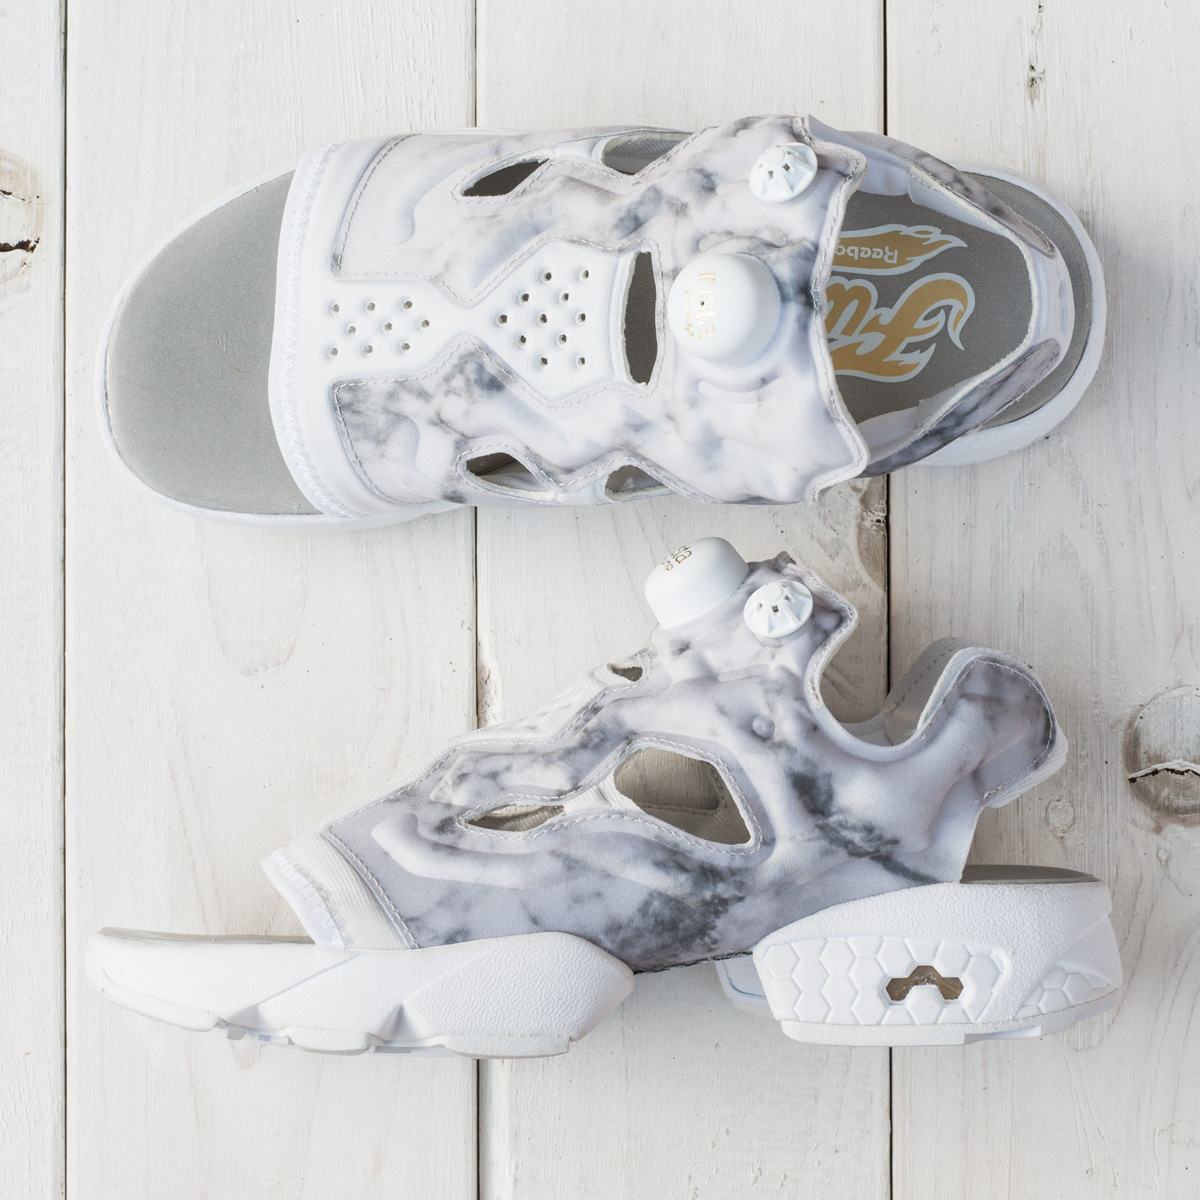 Reebok INSTAPUMP FURY SANDAL (リーボック インスタ ポンプフューリー サンダル)STEEL/WHITE/WHITE/GOLDMETALLIC【レディース スニーカー】18SS-S